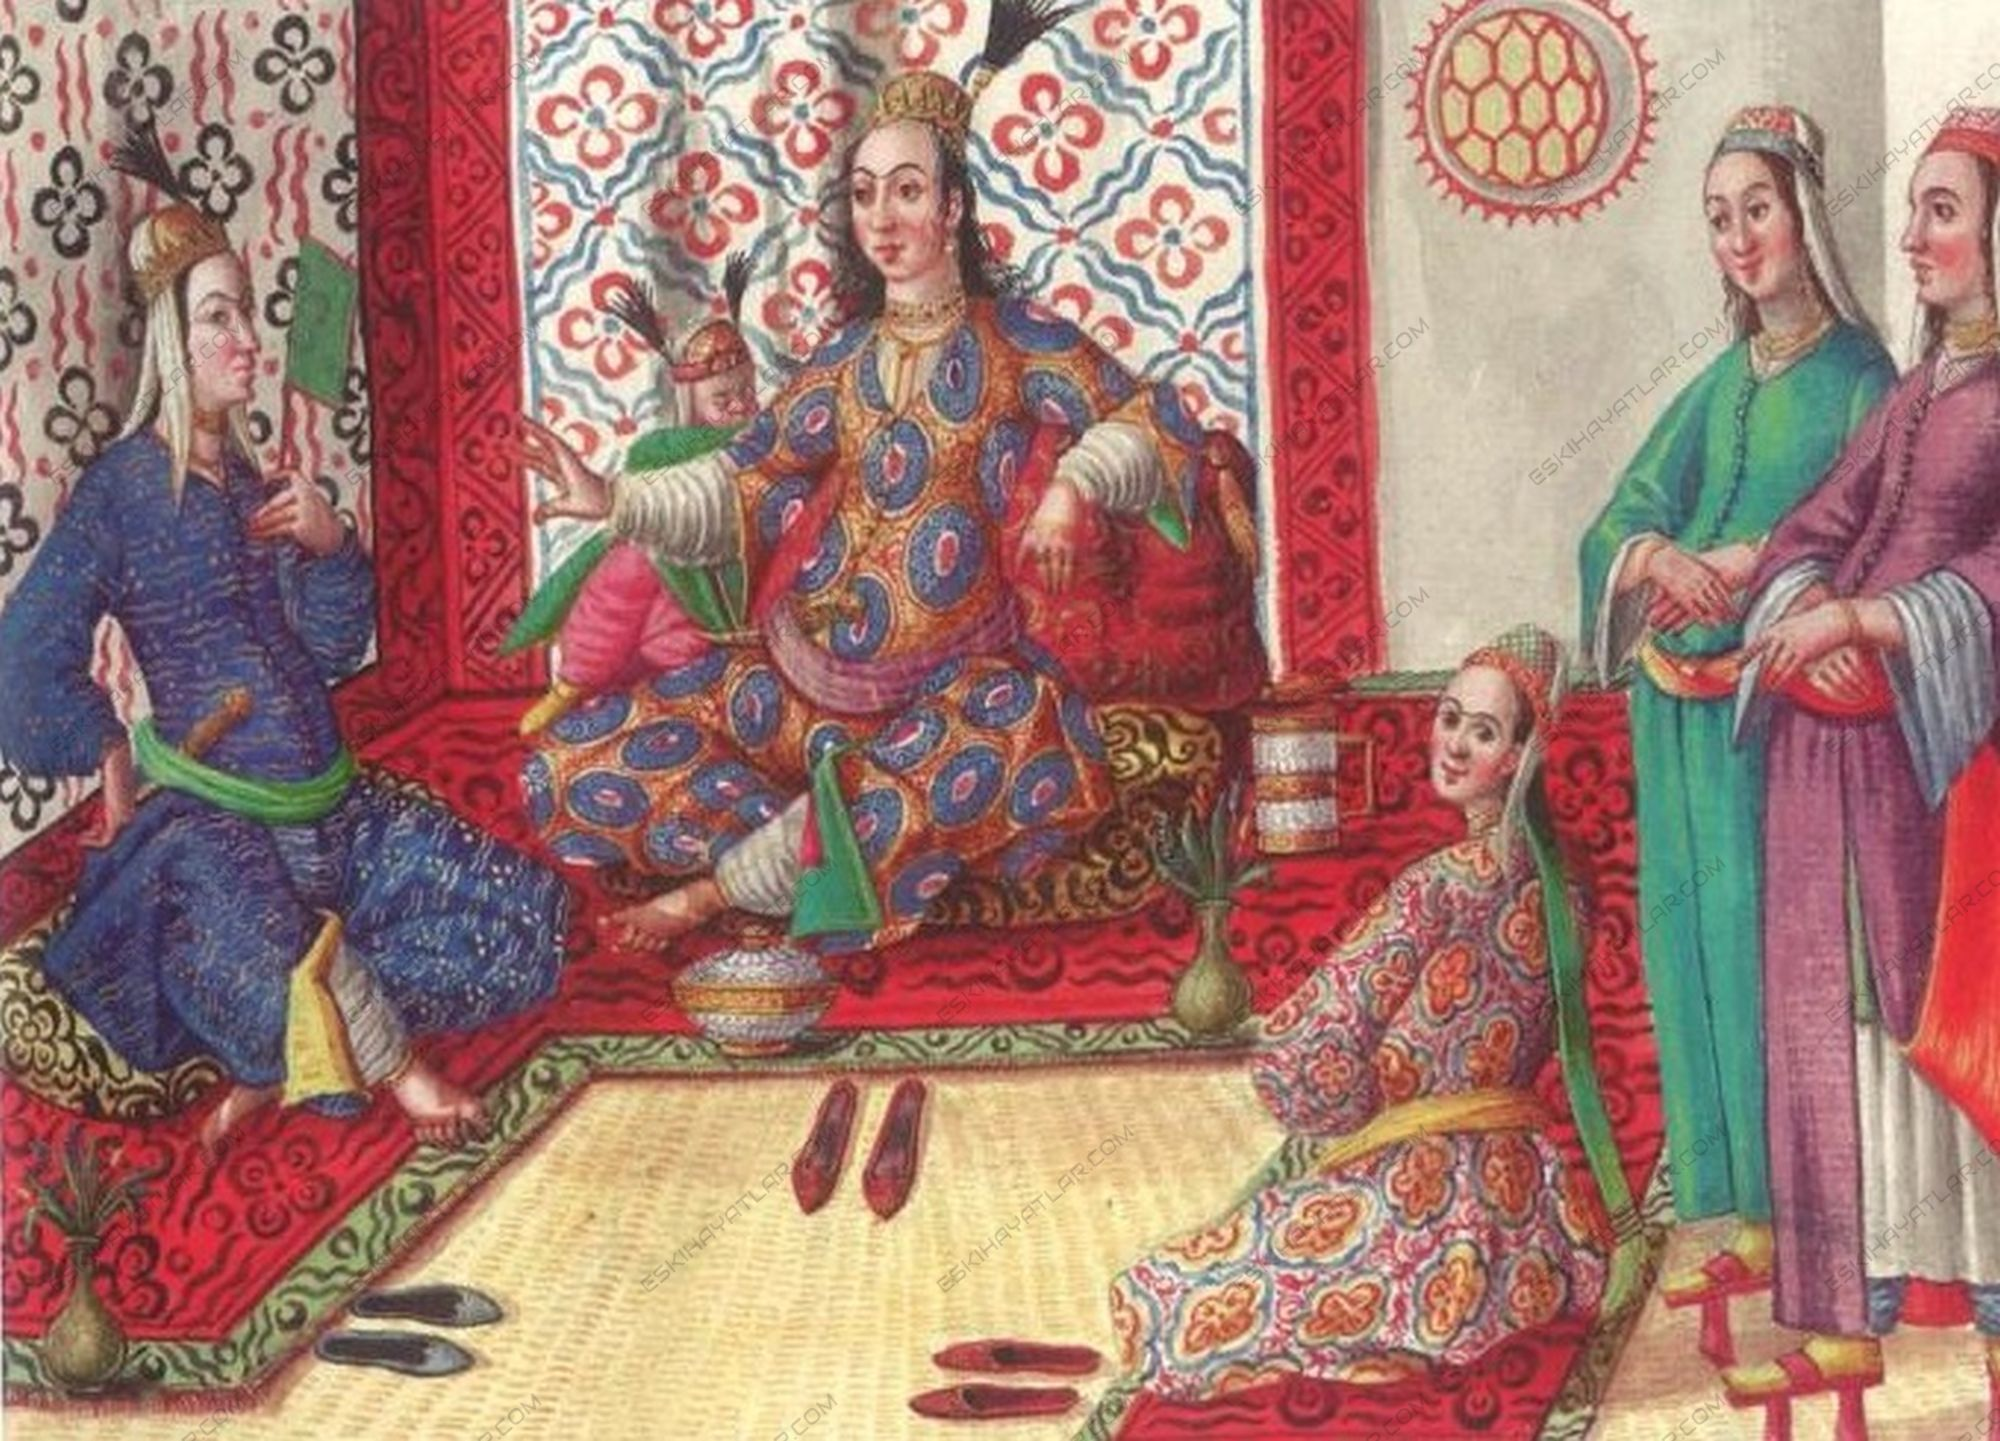 0376-17-yuzyilda-avrupada-turk-modasi-terrible-turk-osmanli-kiyafetleri (10)